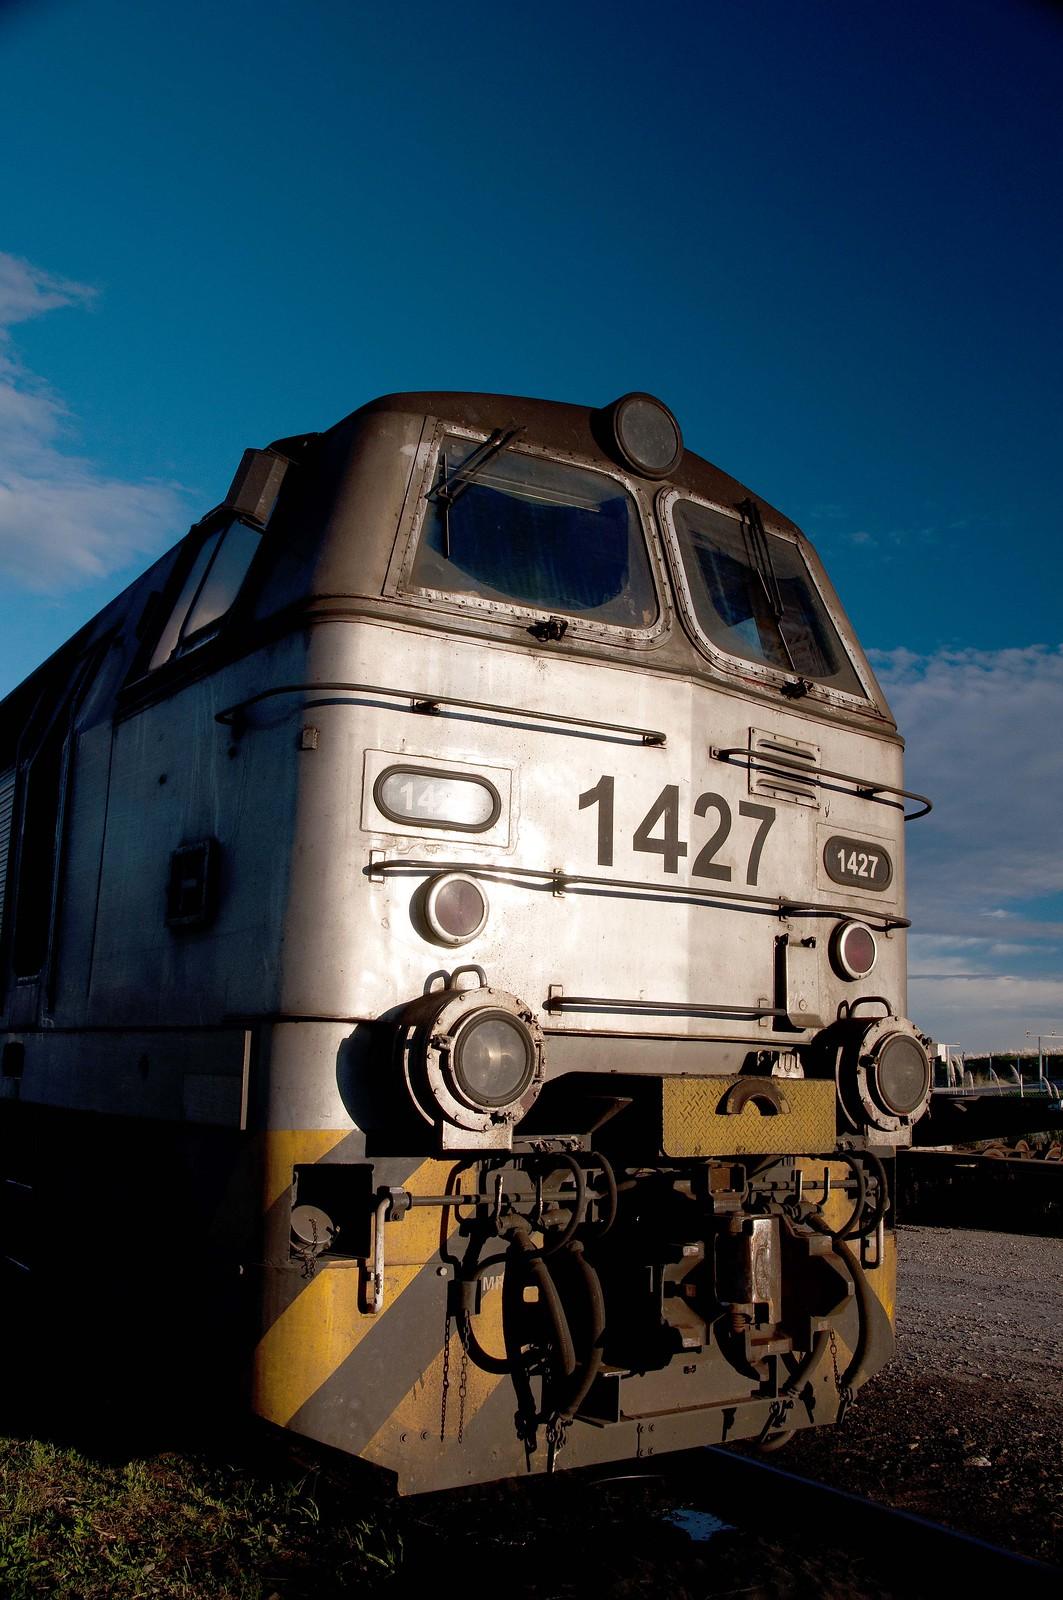 Independent Rail Australia's 1427 by John Cowper